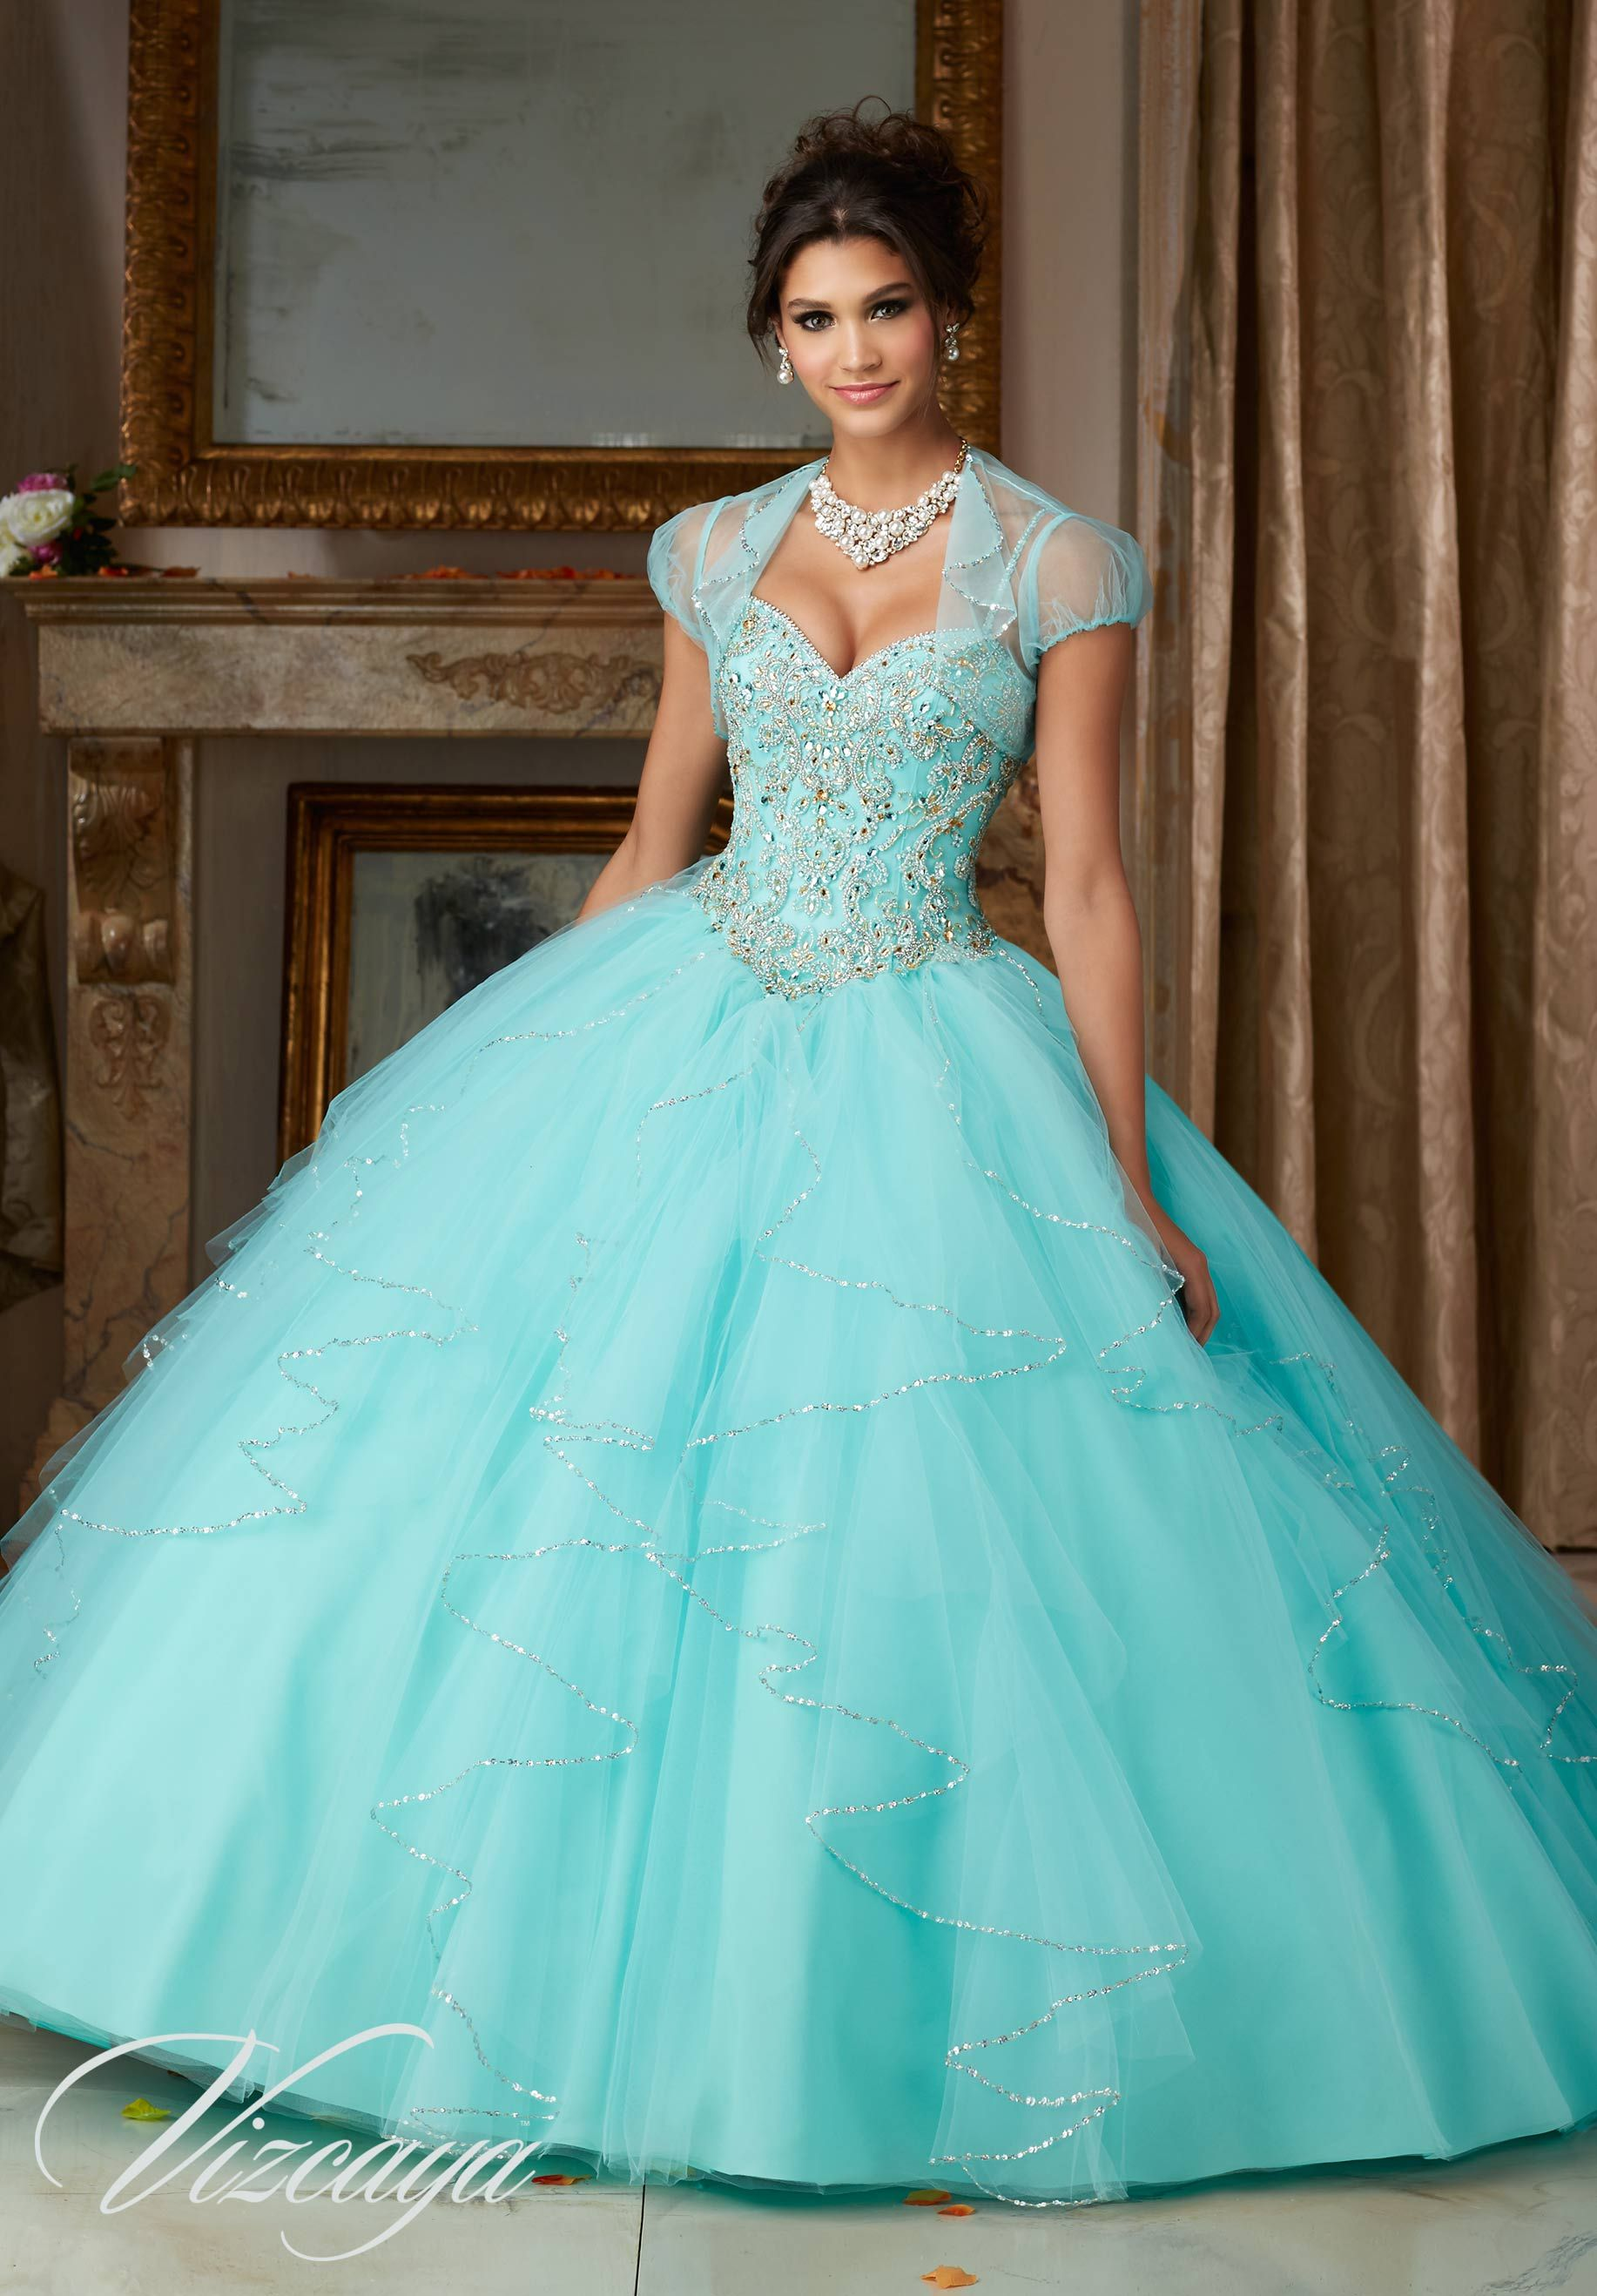 Jeweled beading on a flounced tulle quinceañera dress promhi